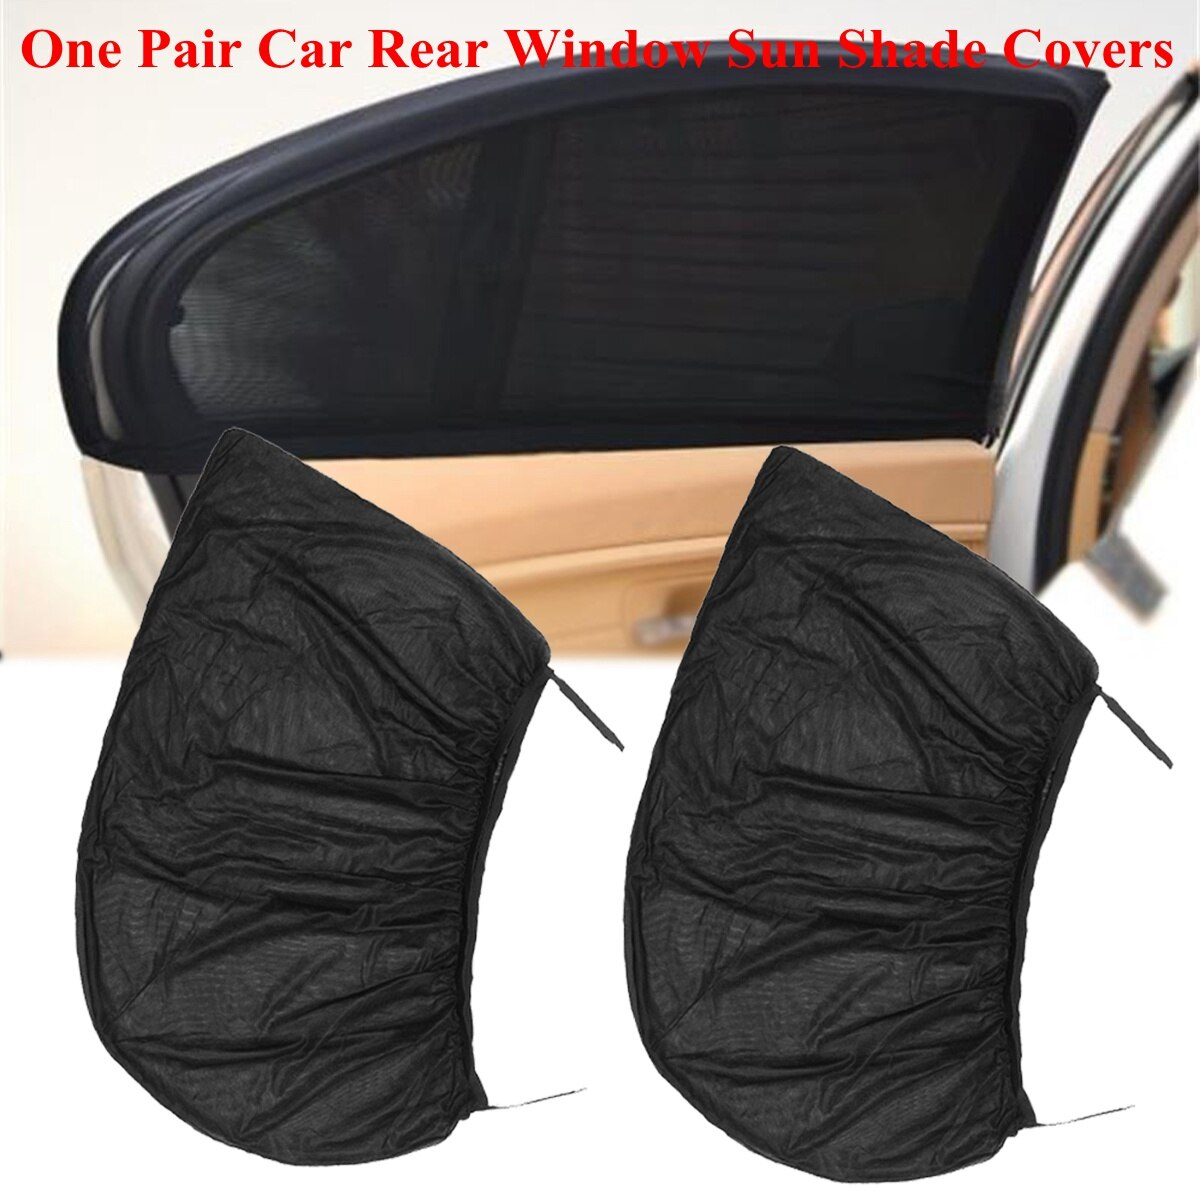 2 uds cubierta para la ventana del coche parasol cortina para Toyota Corolla RAV4 Yaris Honda CRV Juke Nissan X-trail Tiida nota Accesorios